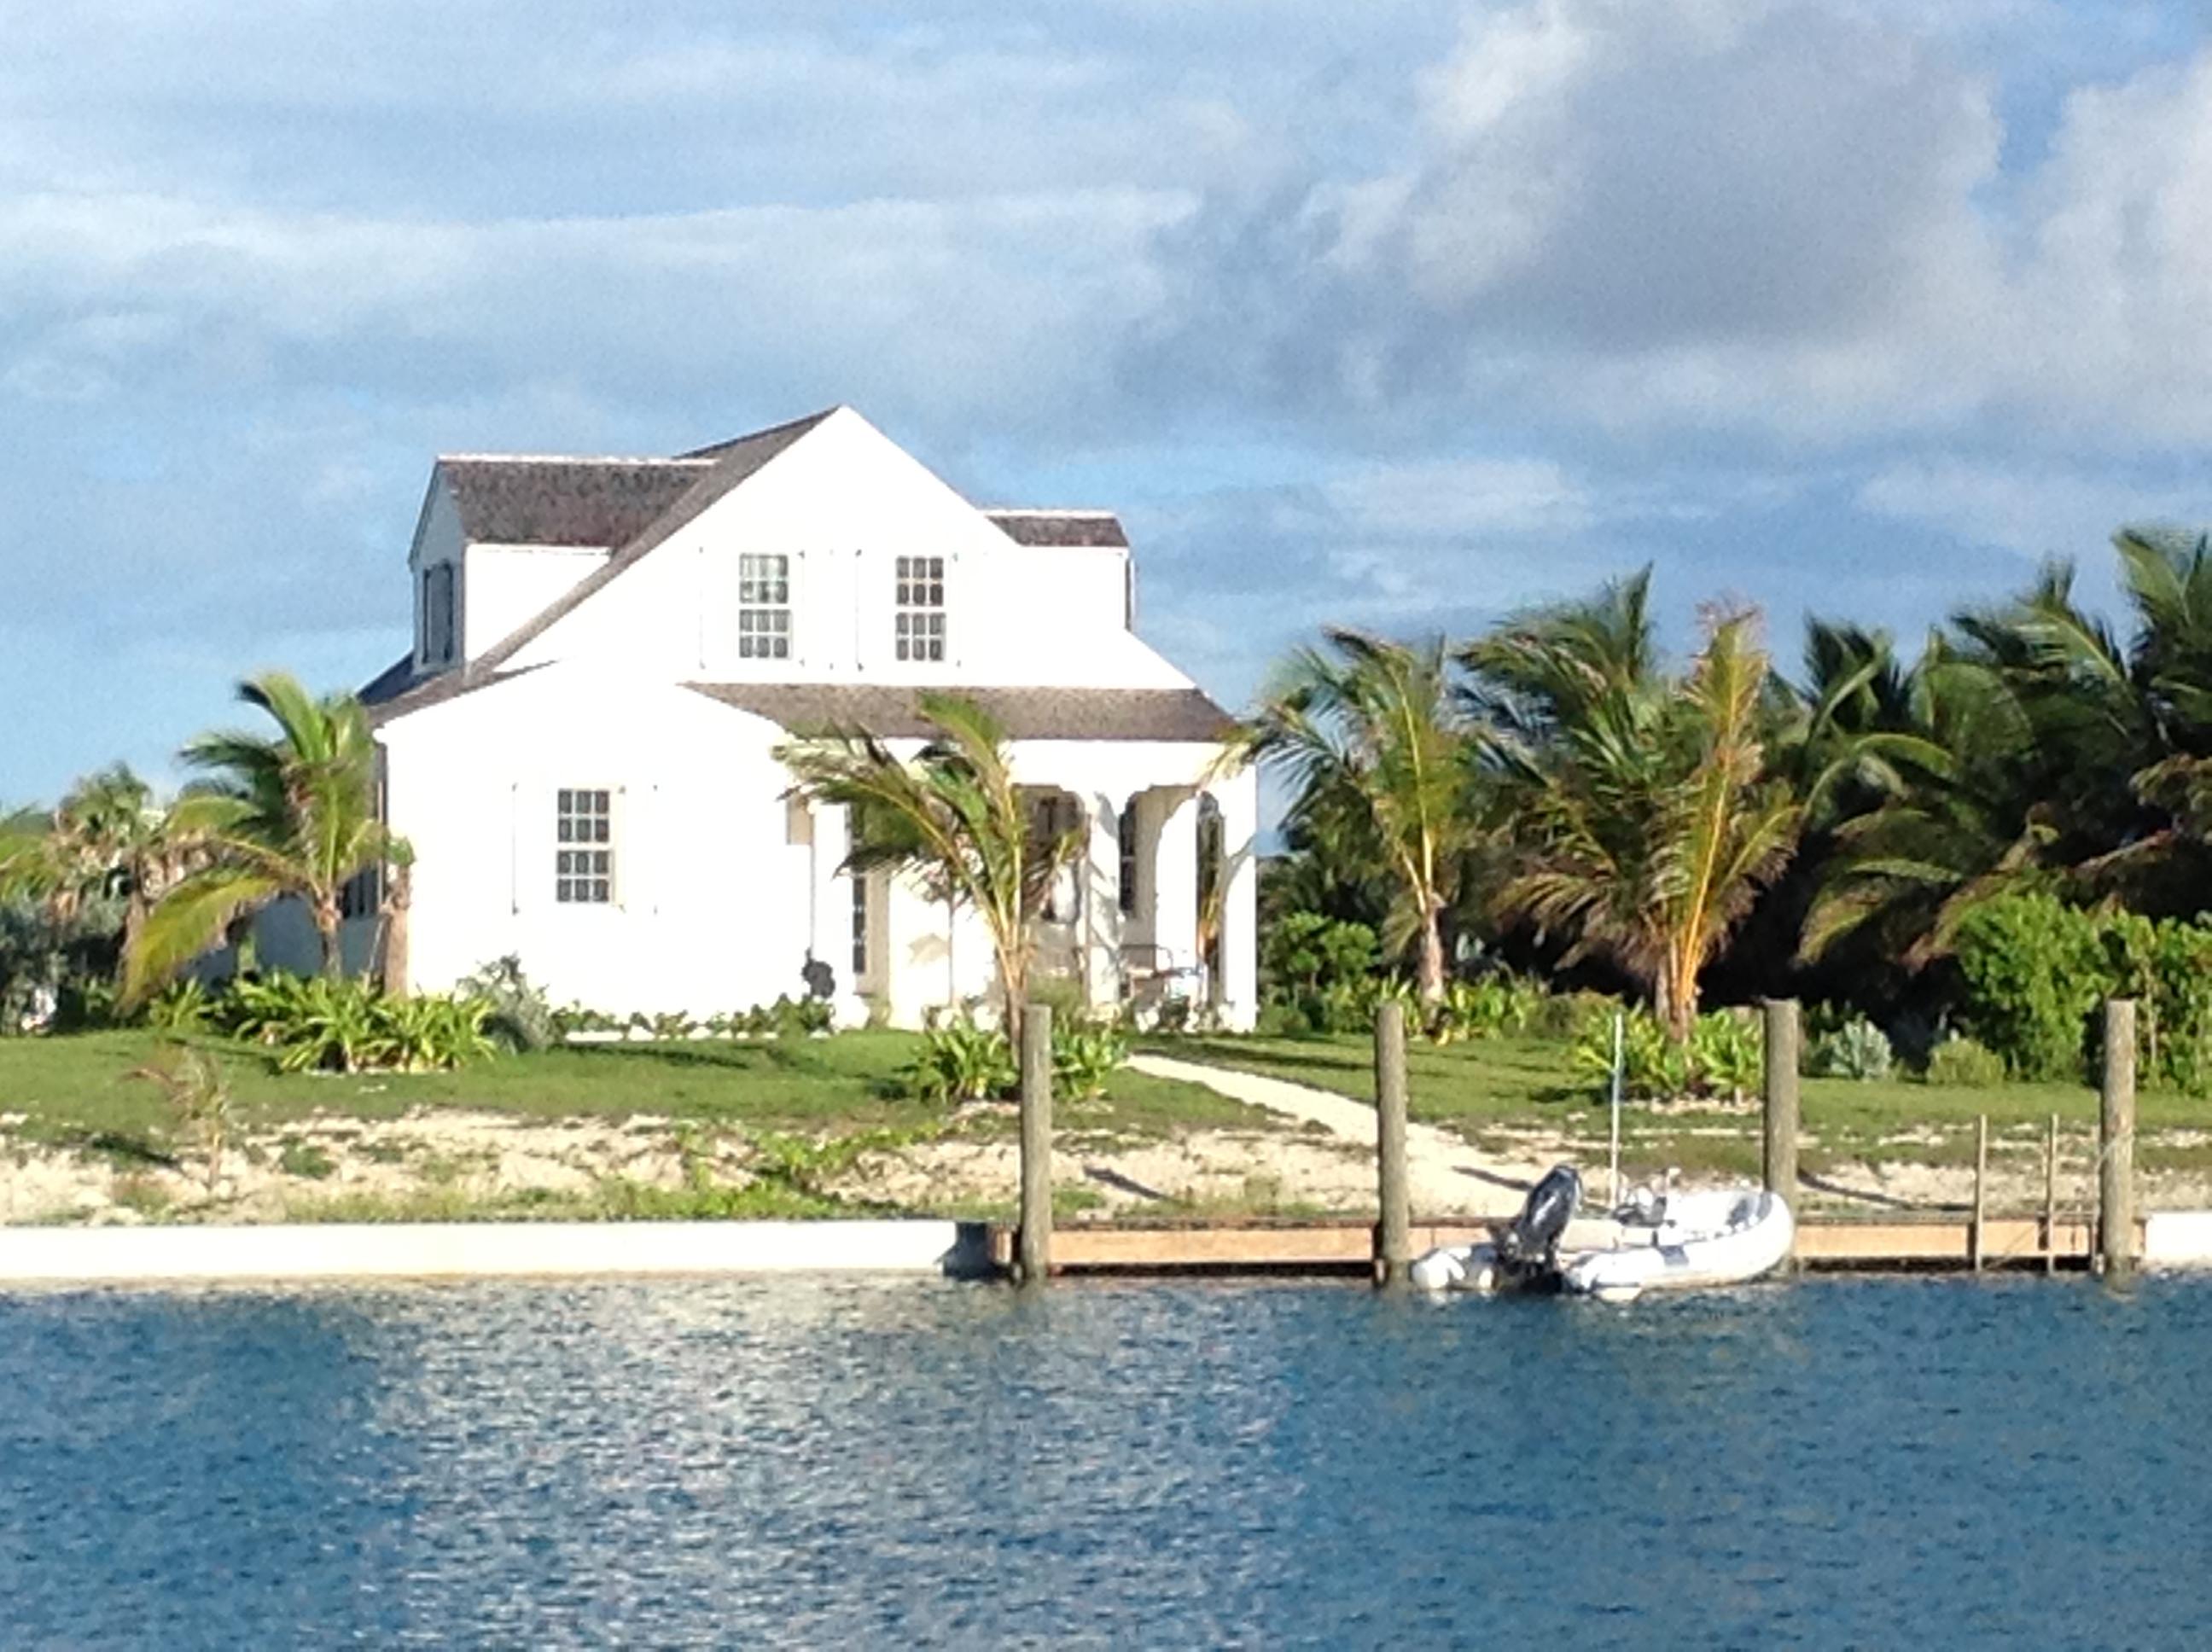 Villa per Vendita alle ore The Pilot House, Schooner Bay Abaco, Abaco, Bahamas